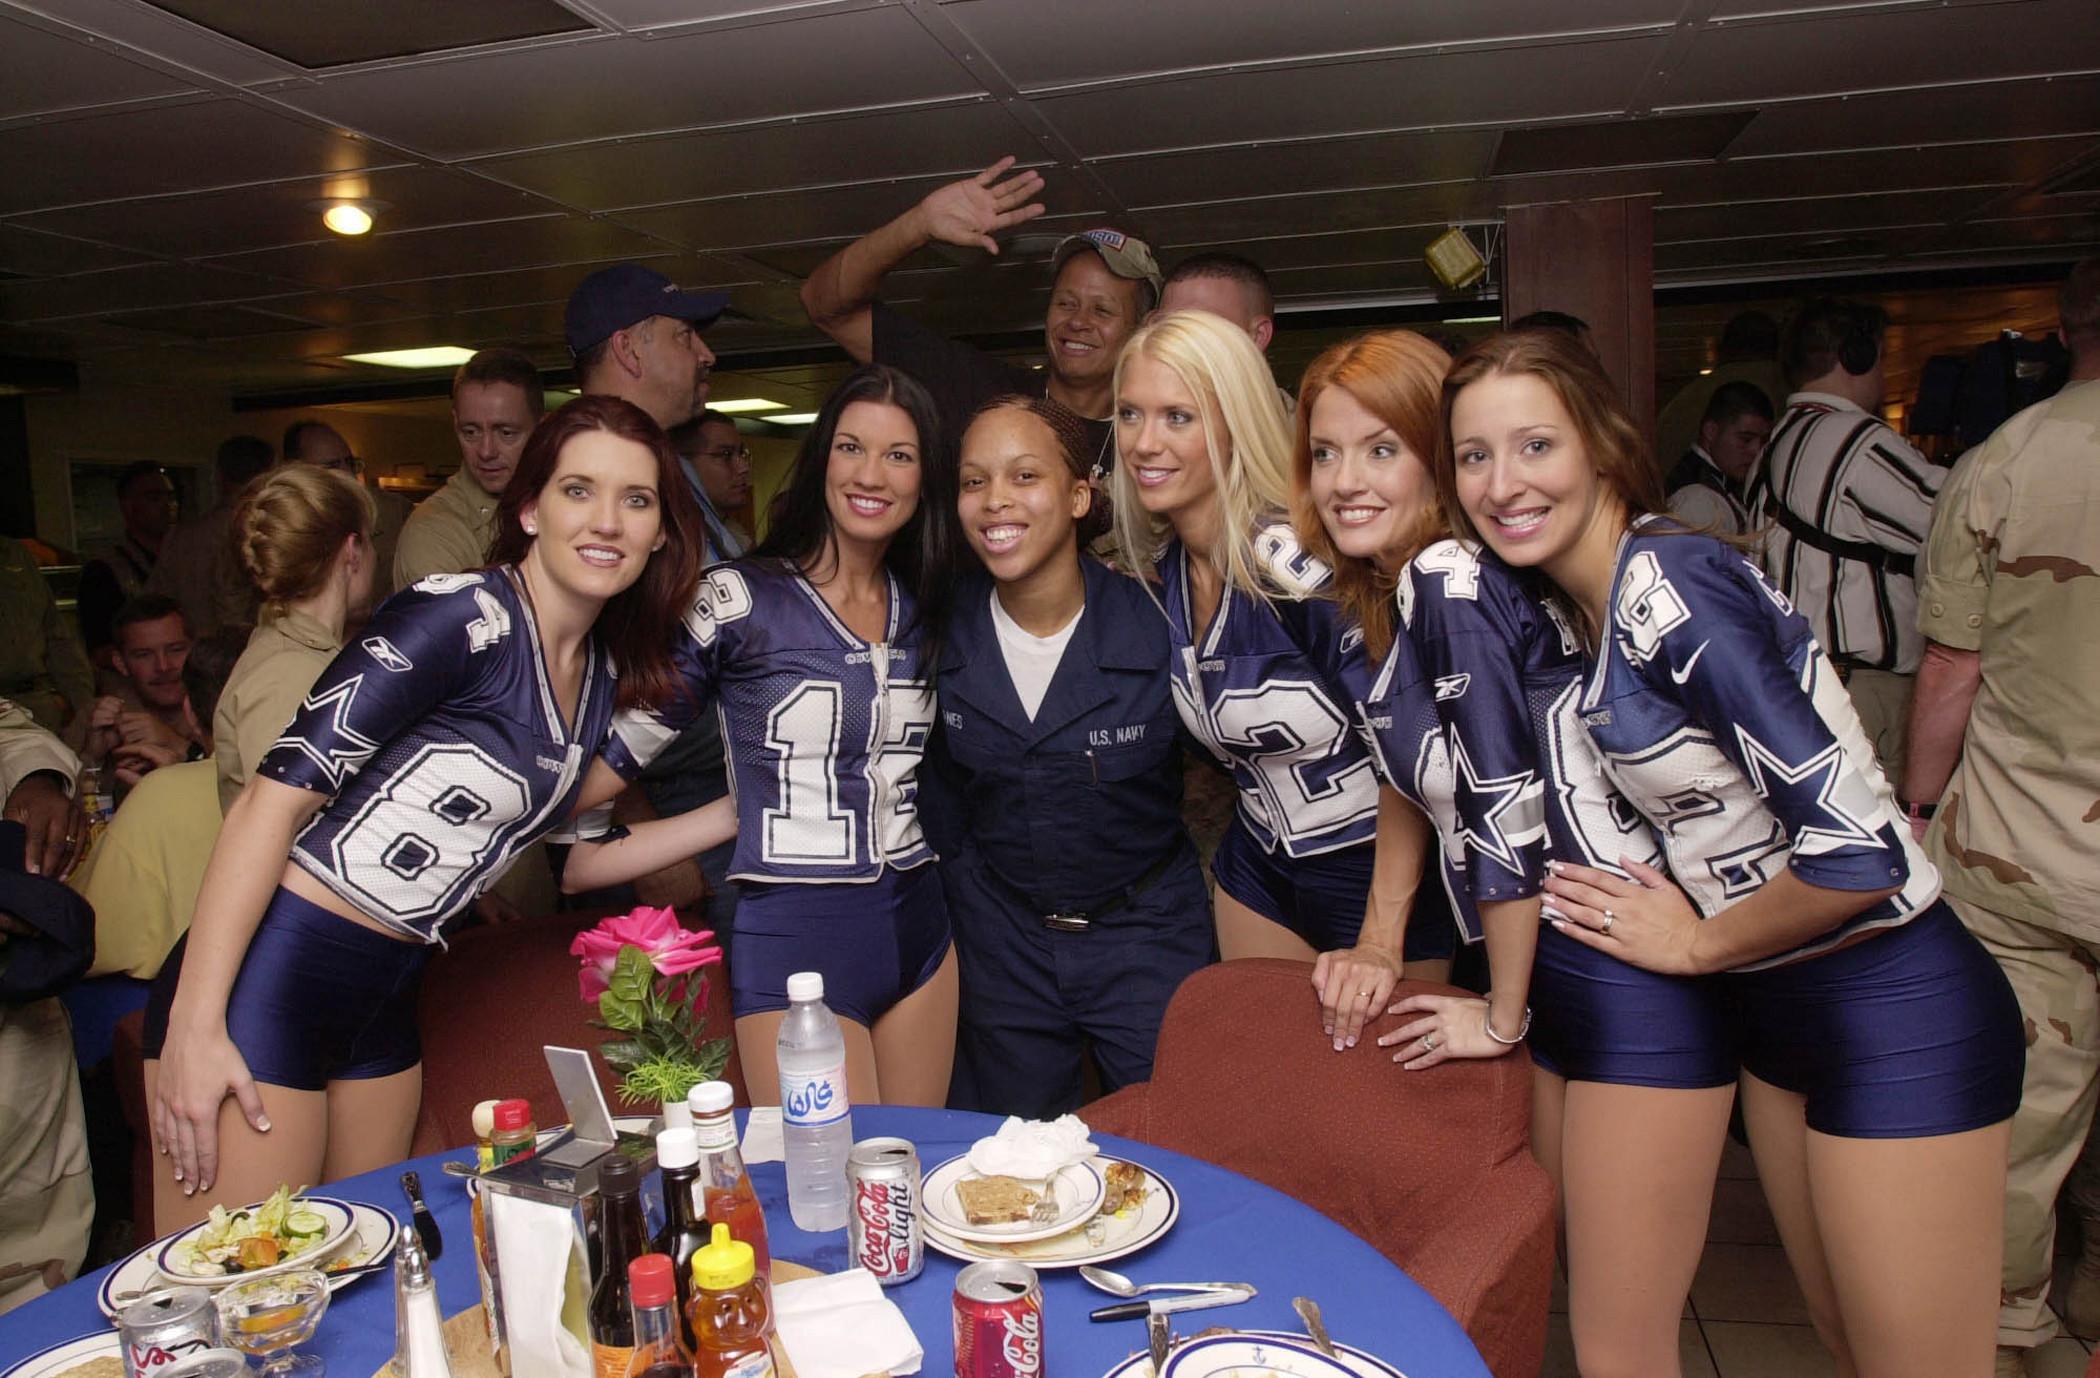 File:Dallas Cowboy Cheerleaders.jpg